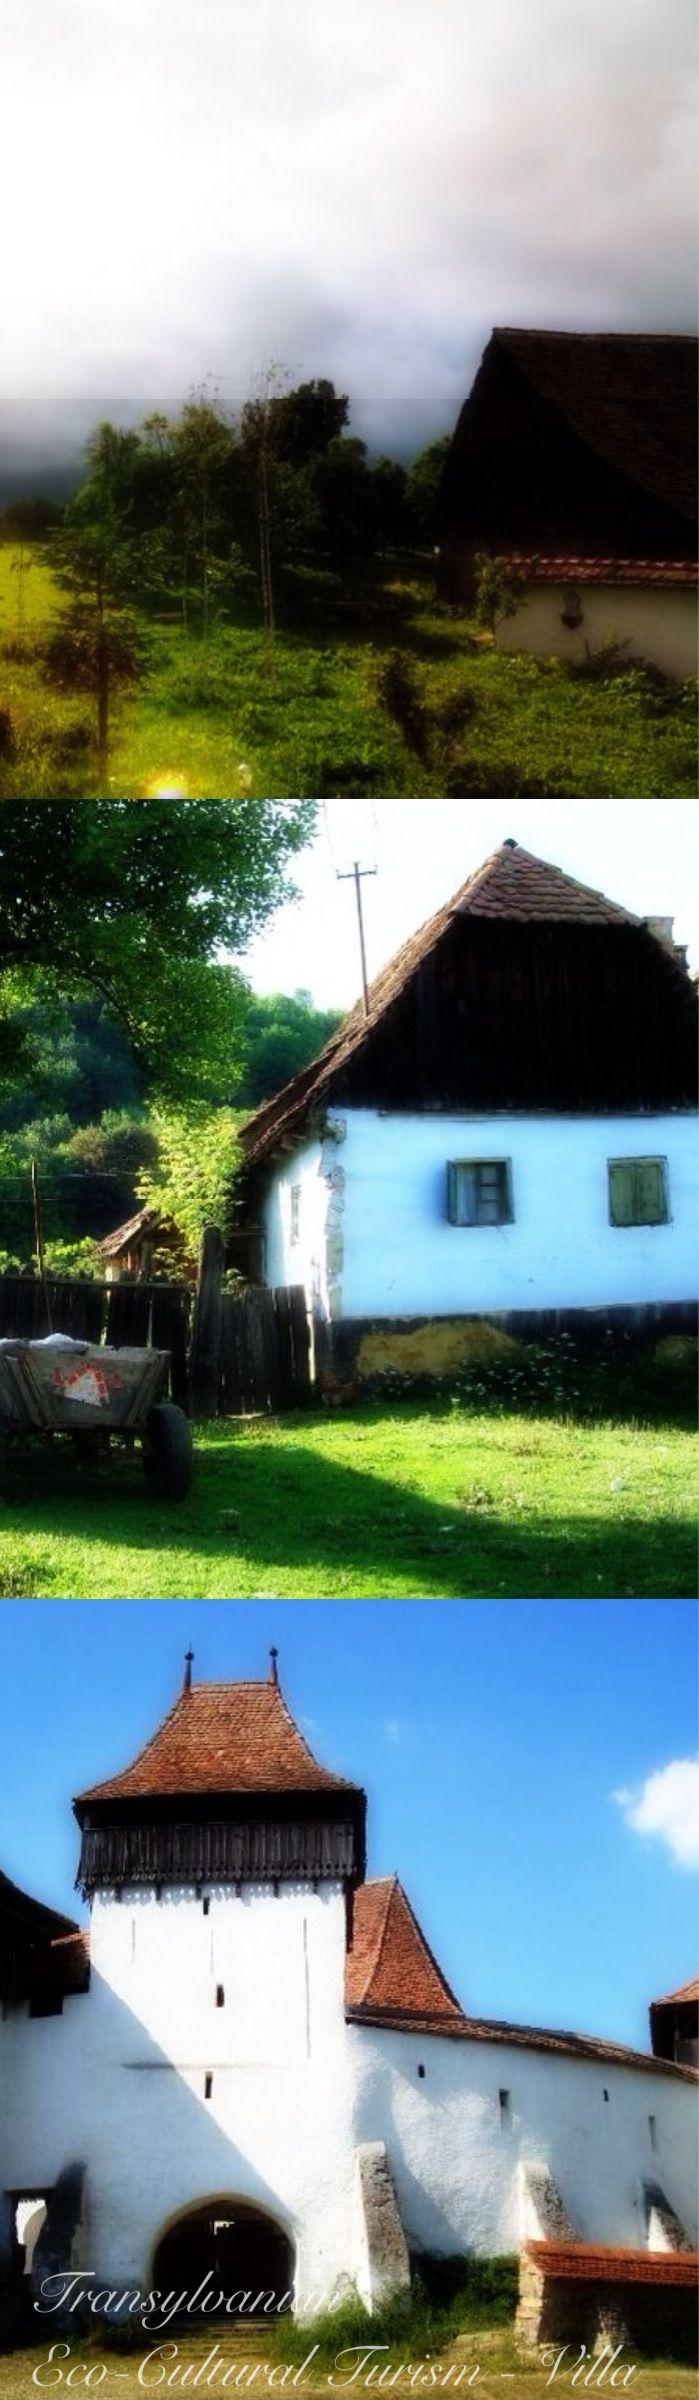 Transivania Romania